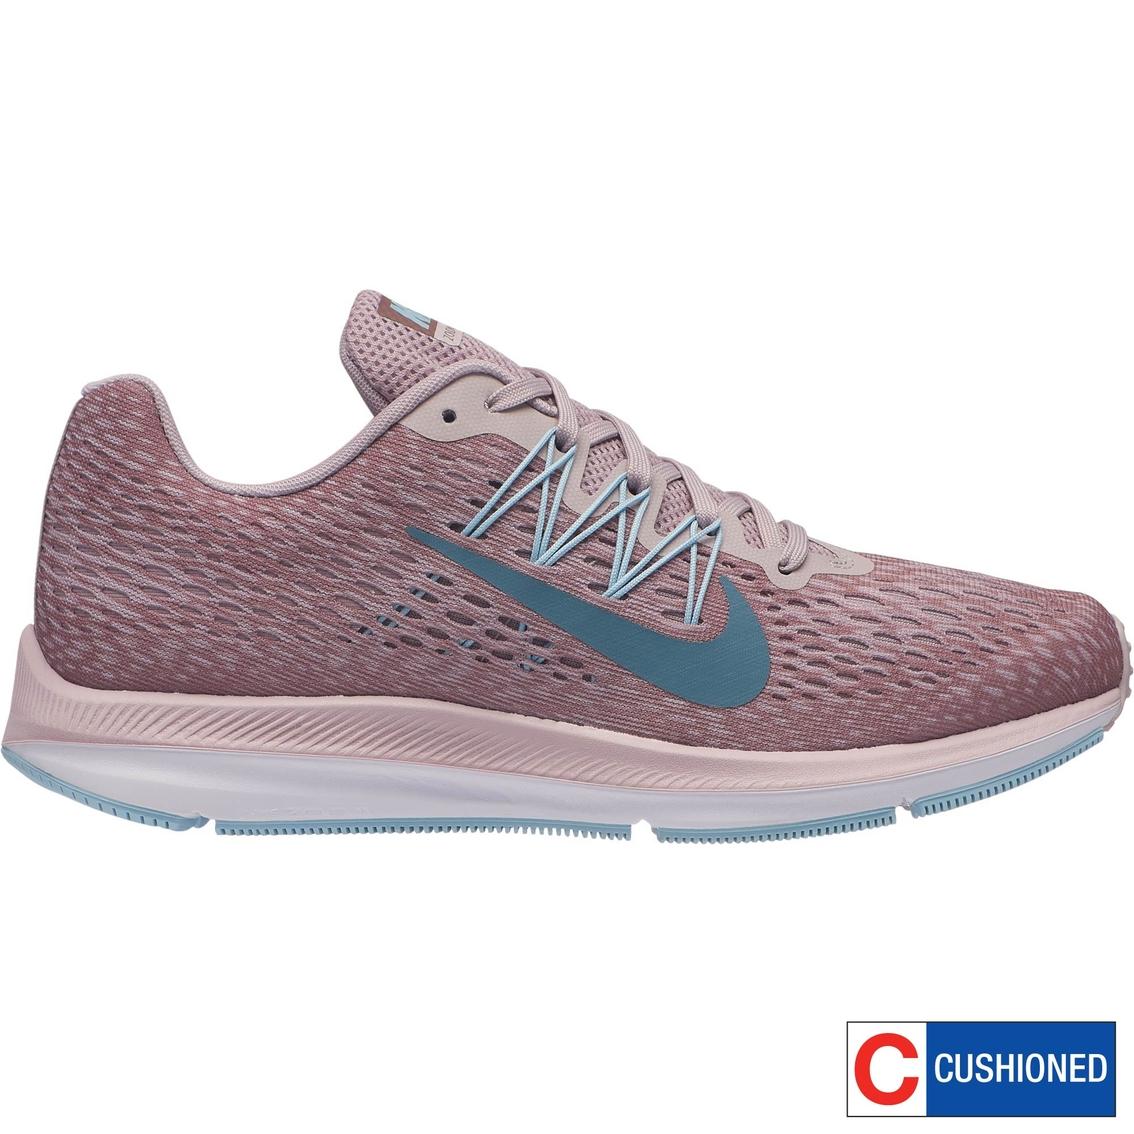 purchase cheap 498b7 469fc Nike Women s Air Zoom Winflo 5 Running Shoes